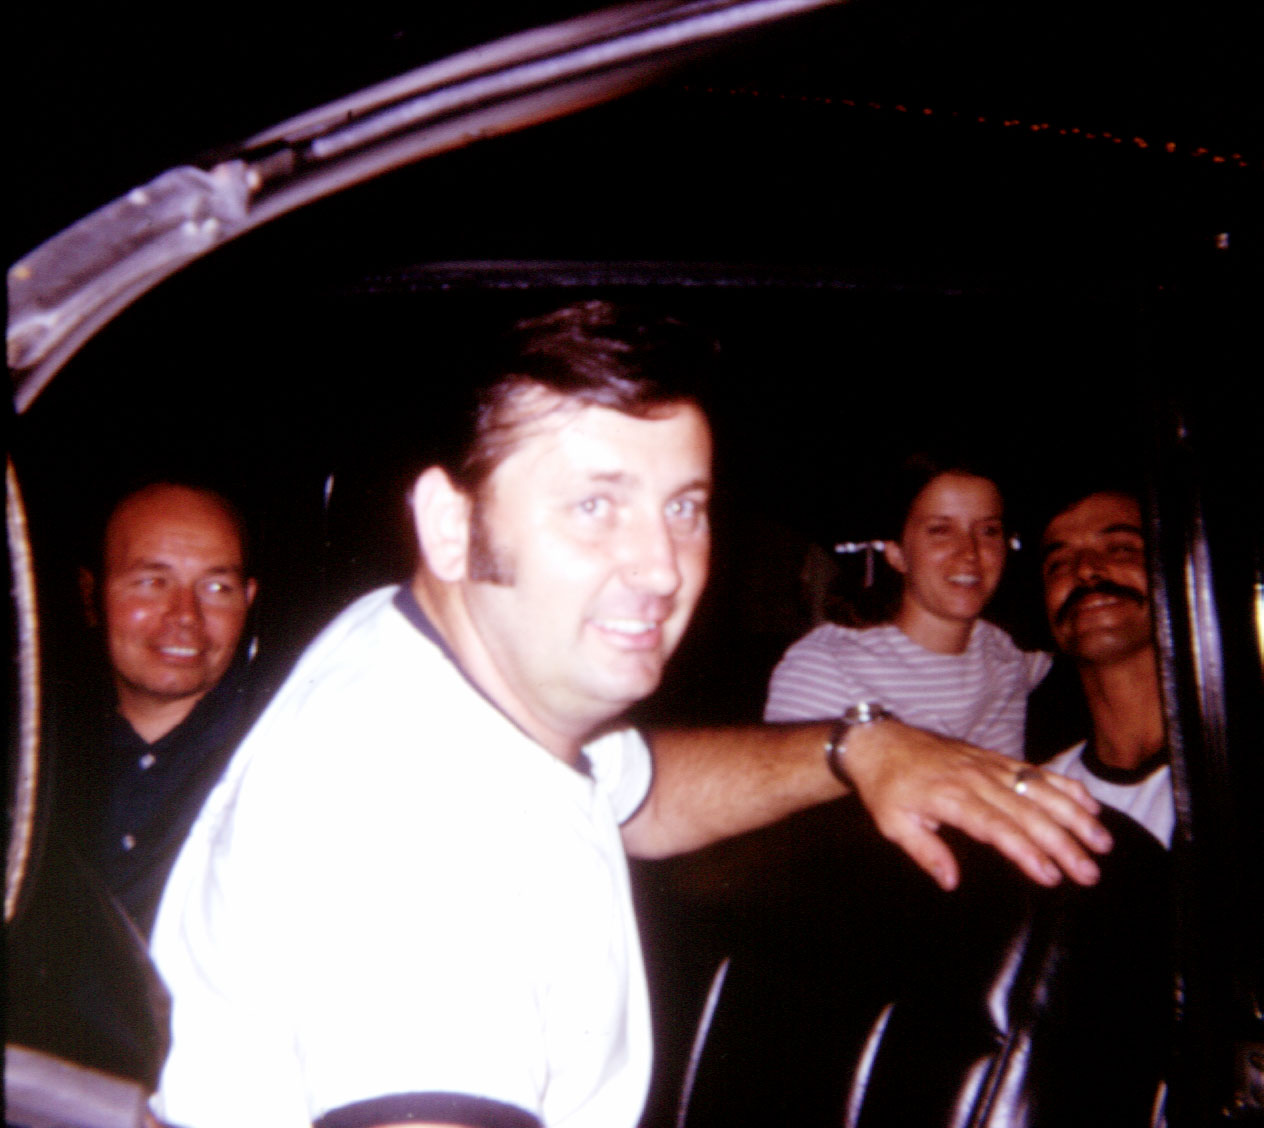 Porkey Leake, Cal Tiefenaur, Maureen, and Don Ward.